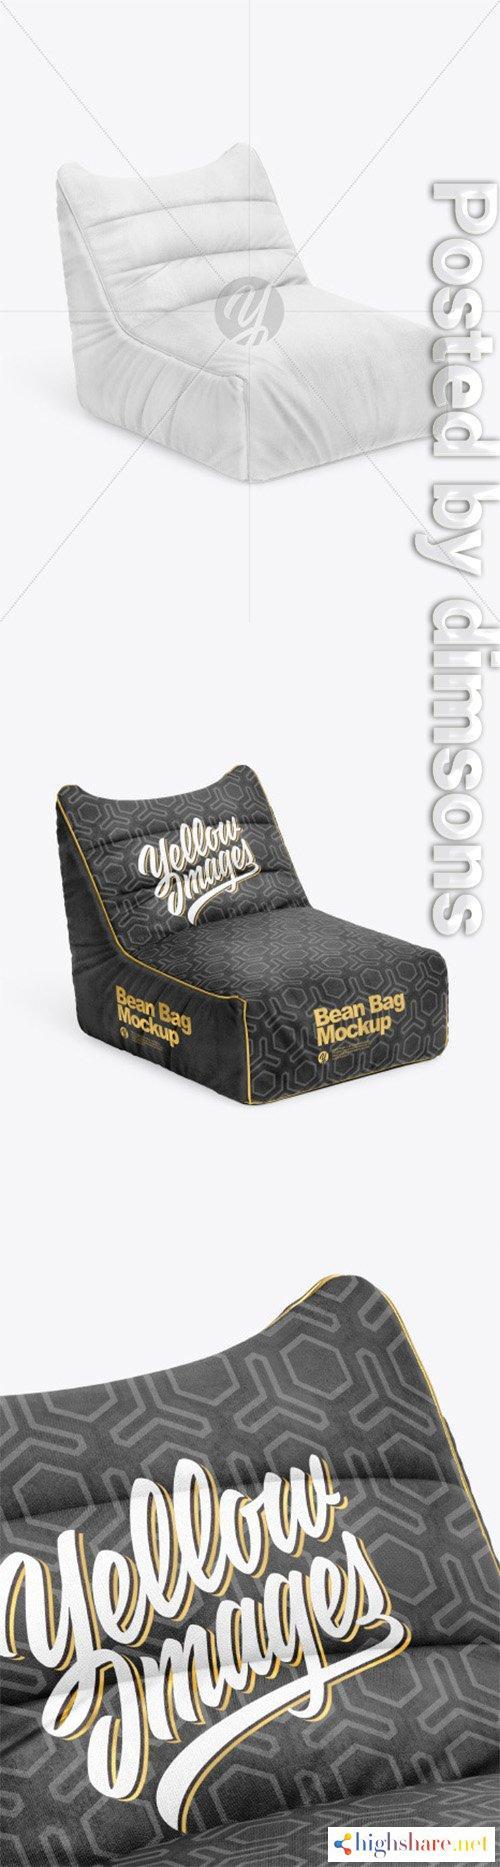 bean bag mockup 64454 5f40b76431ba7 - Bean Bag Mockup 64454